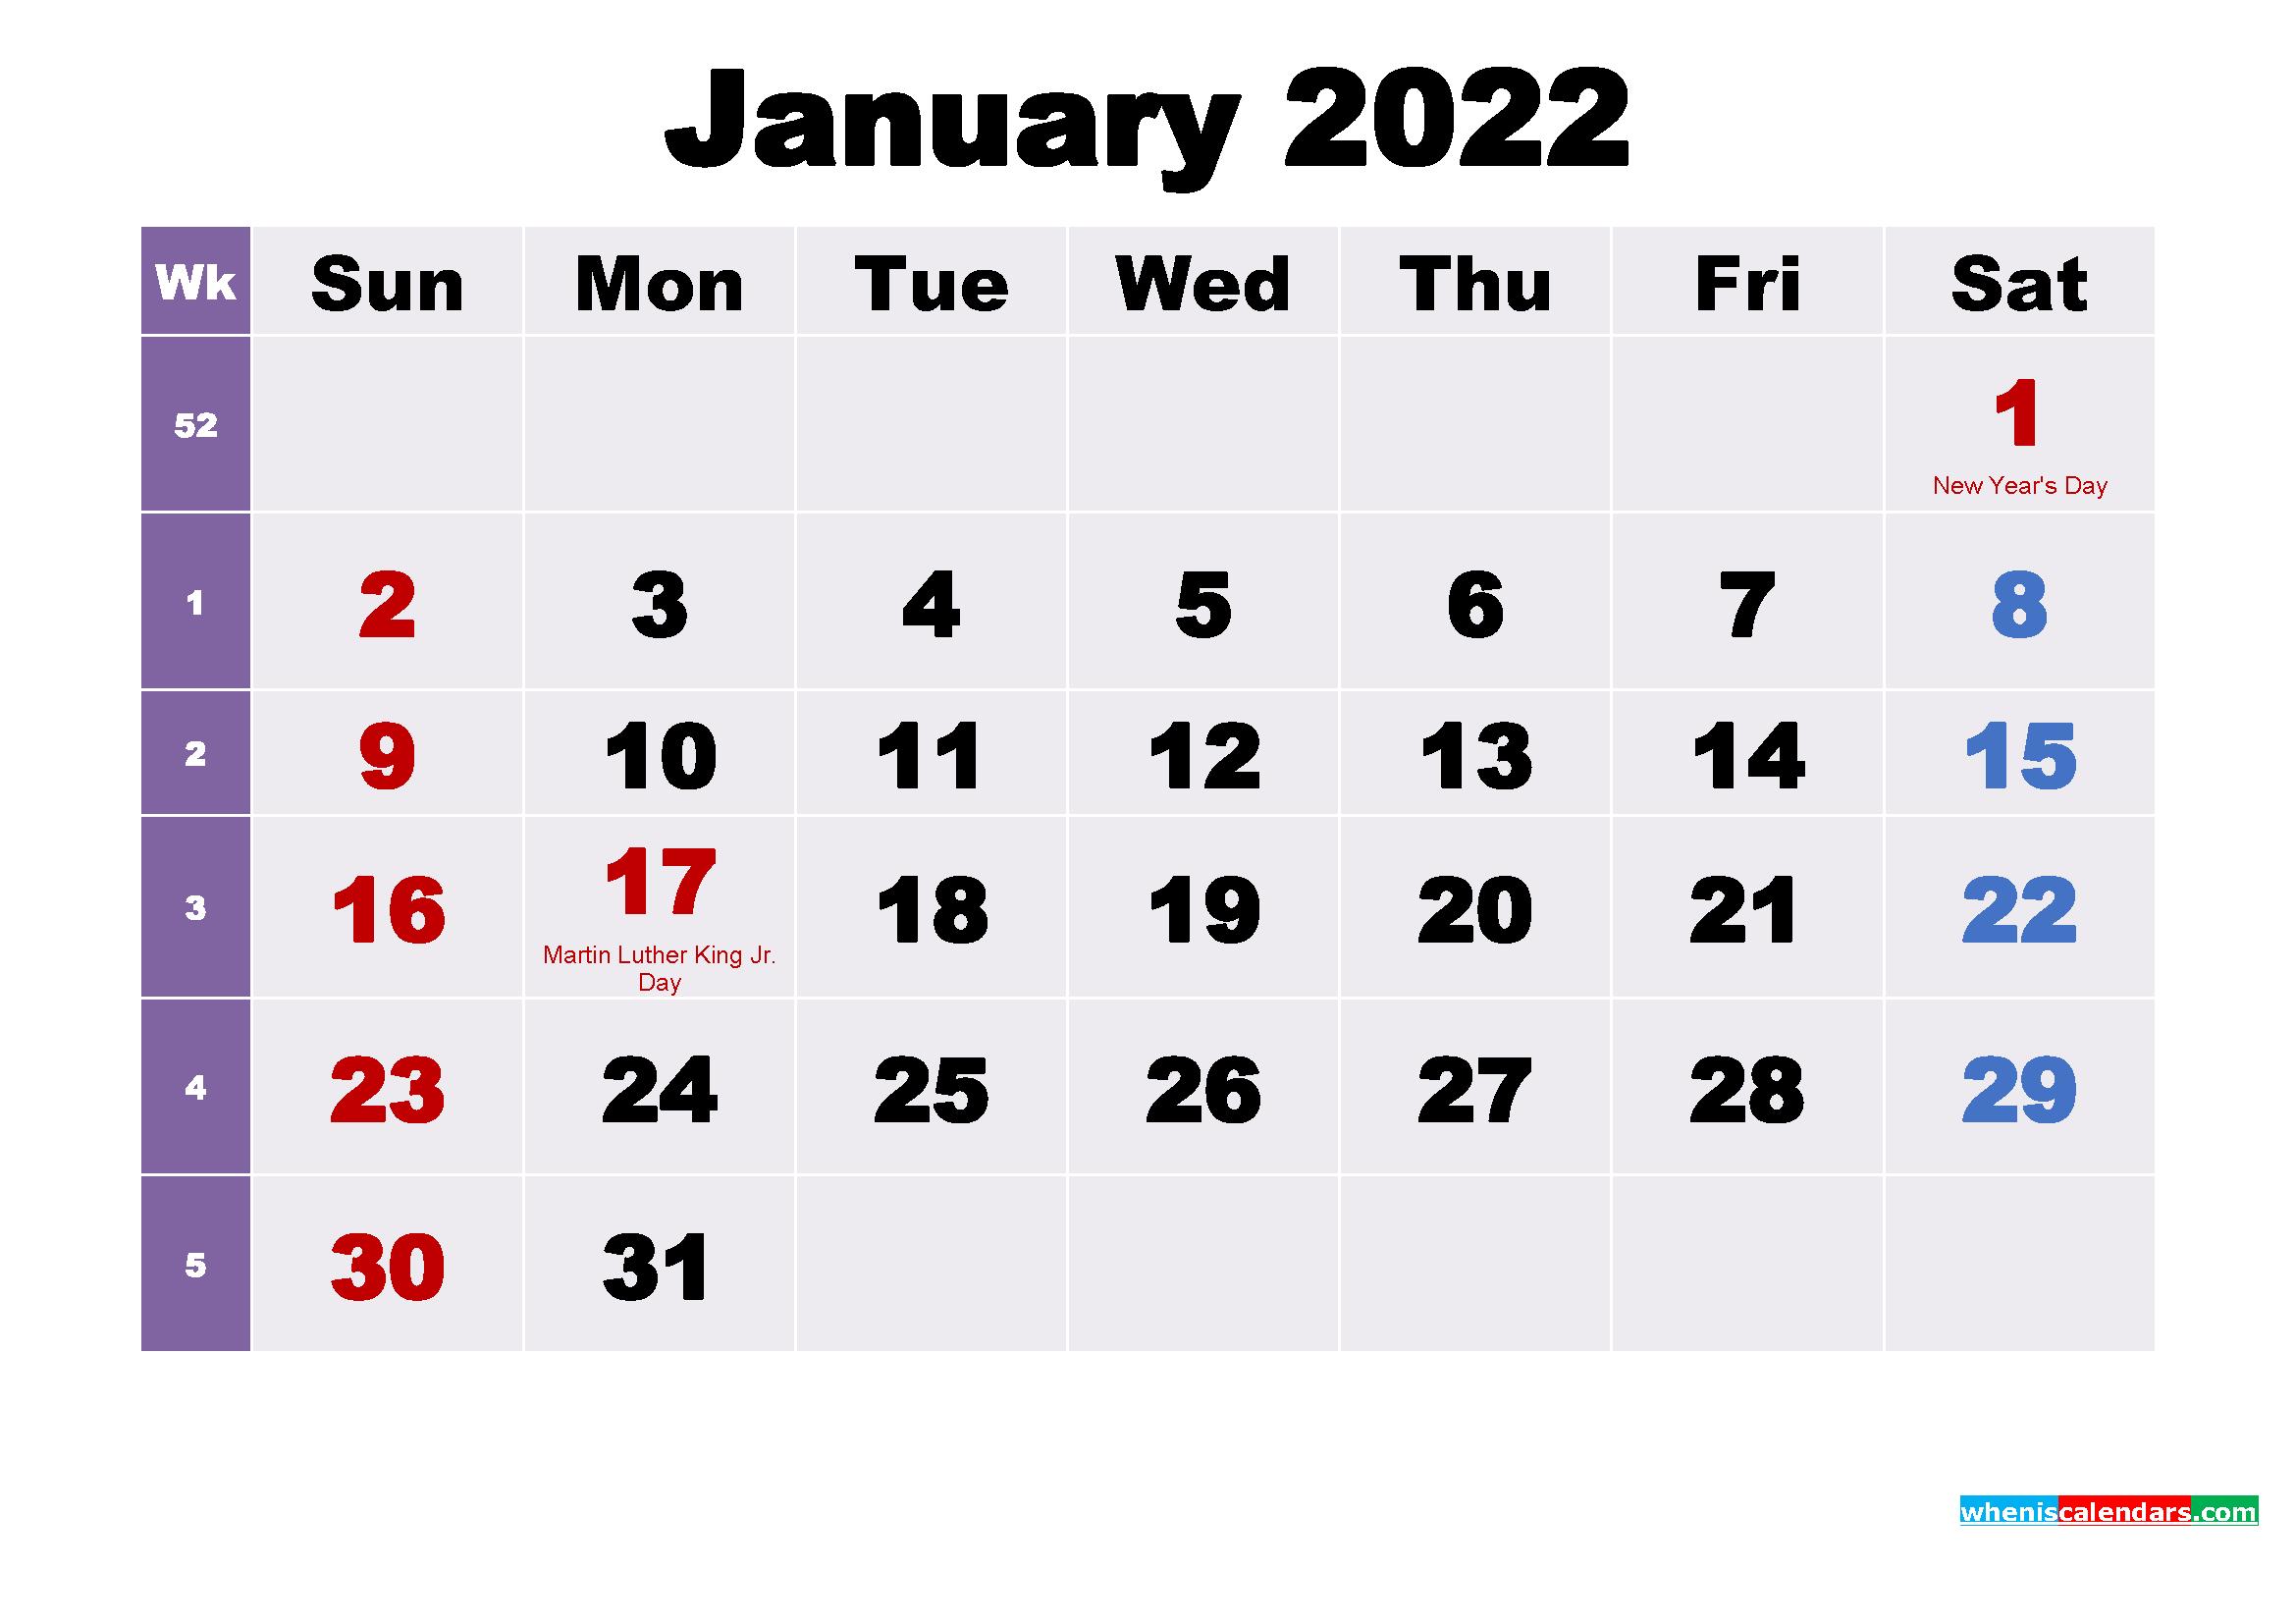 January 2022 Calendar with Holidays Wallpaper